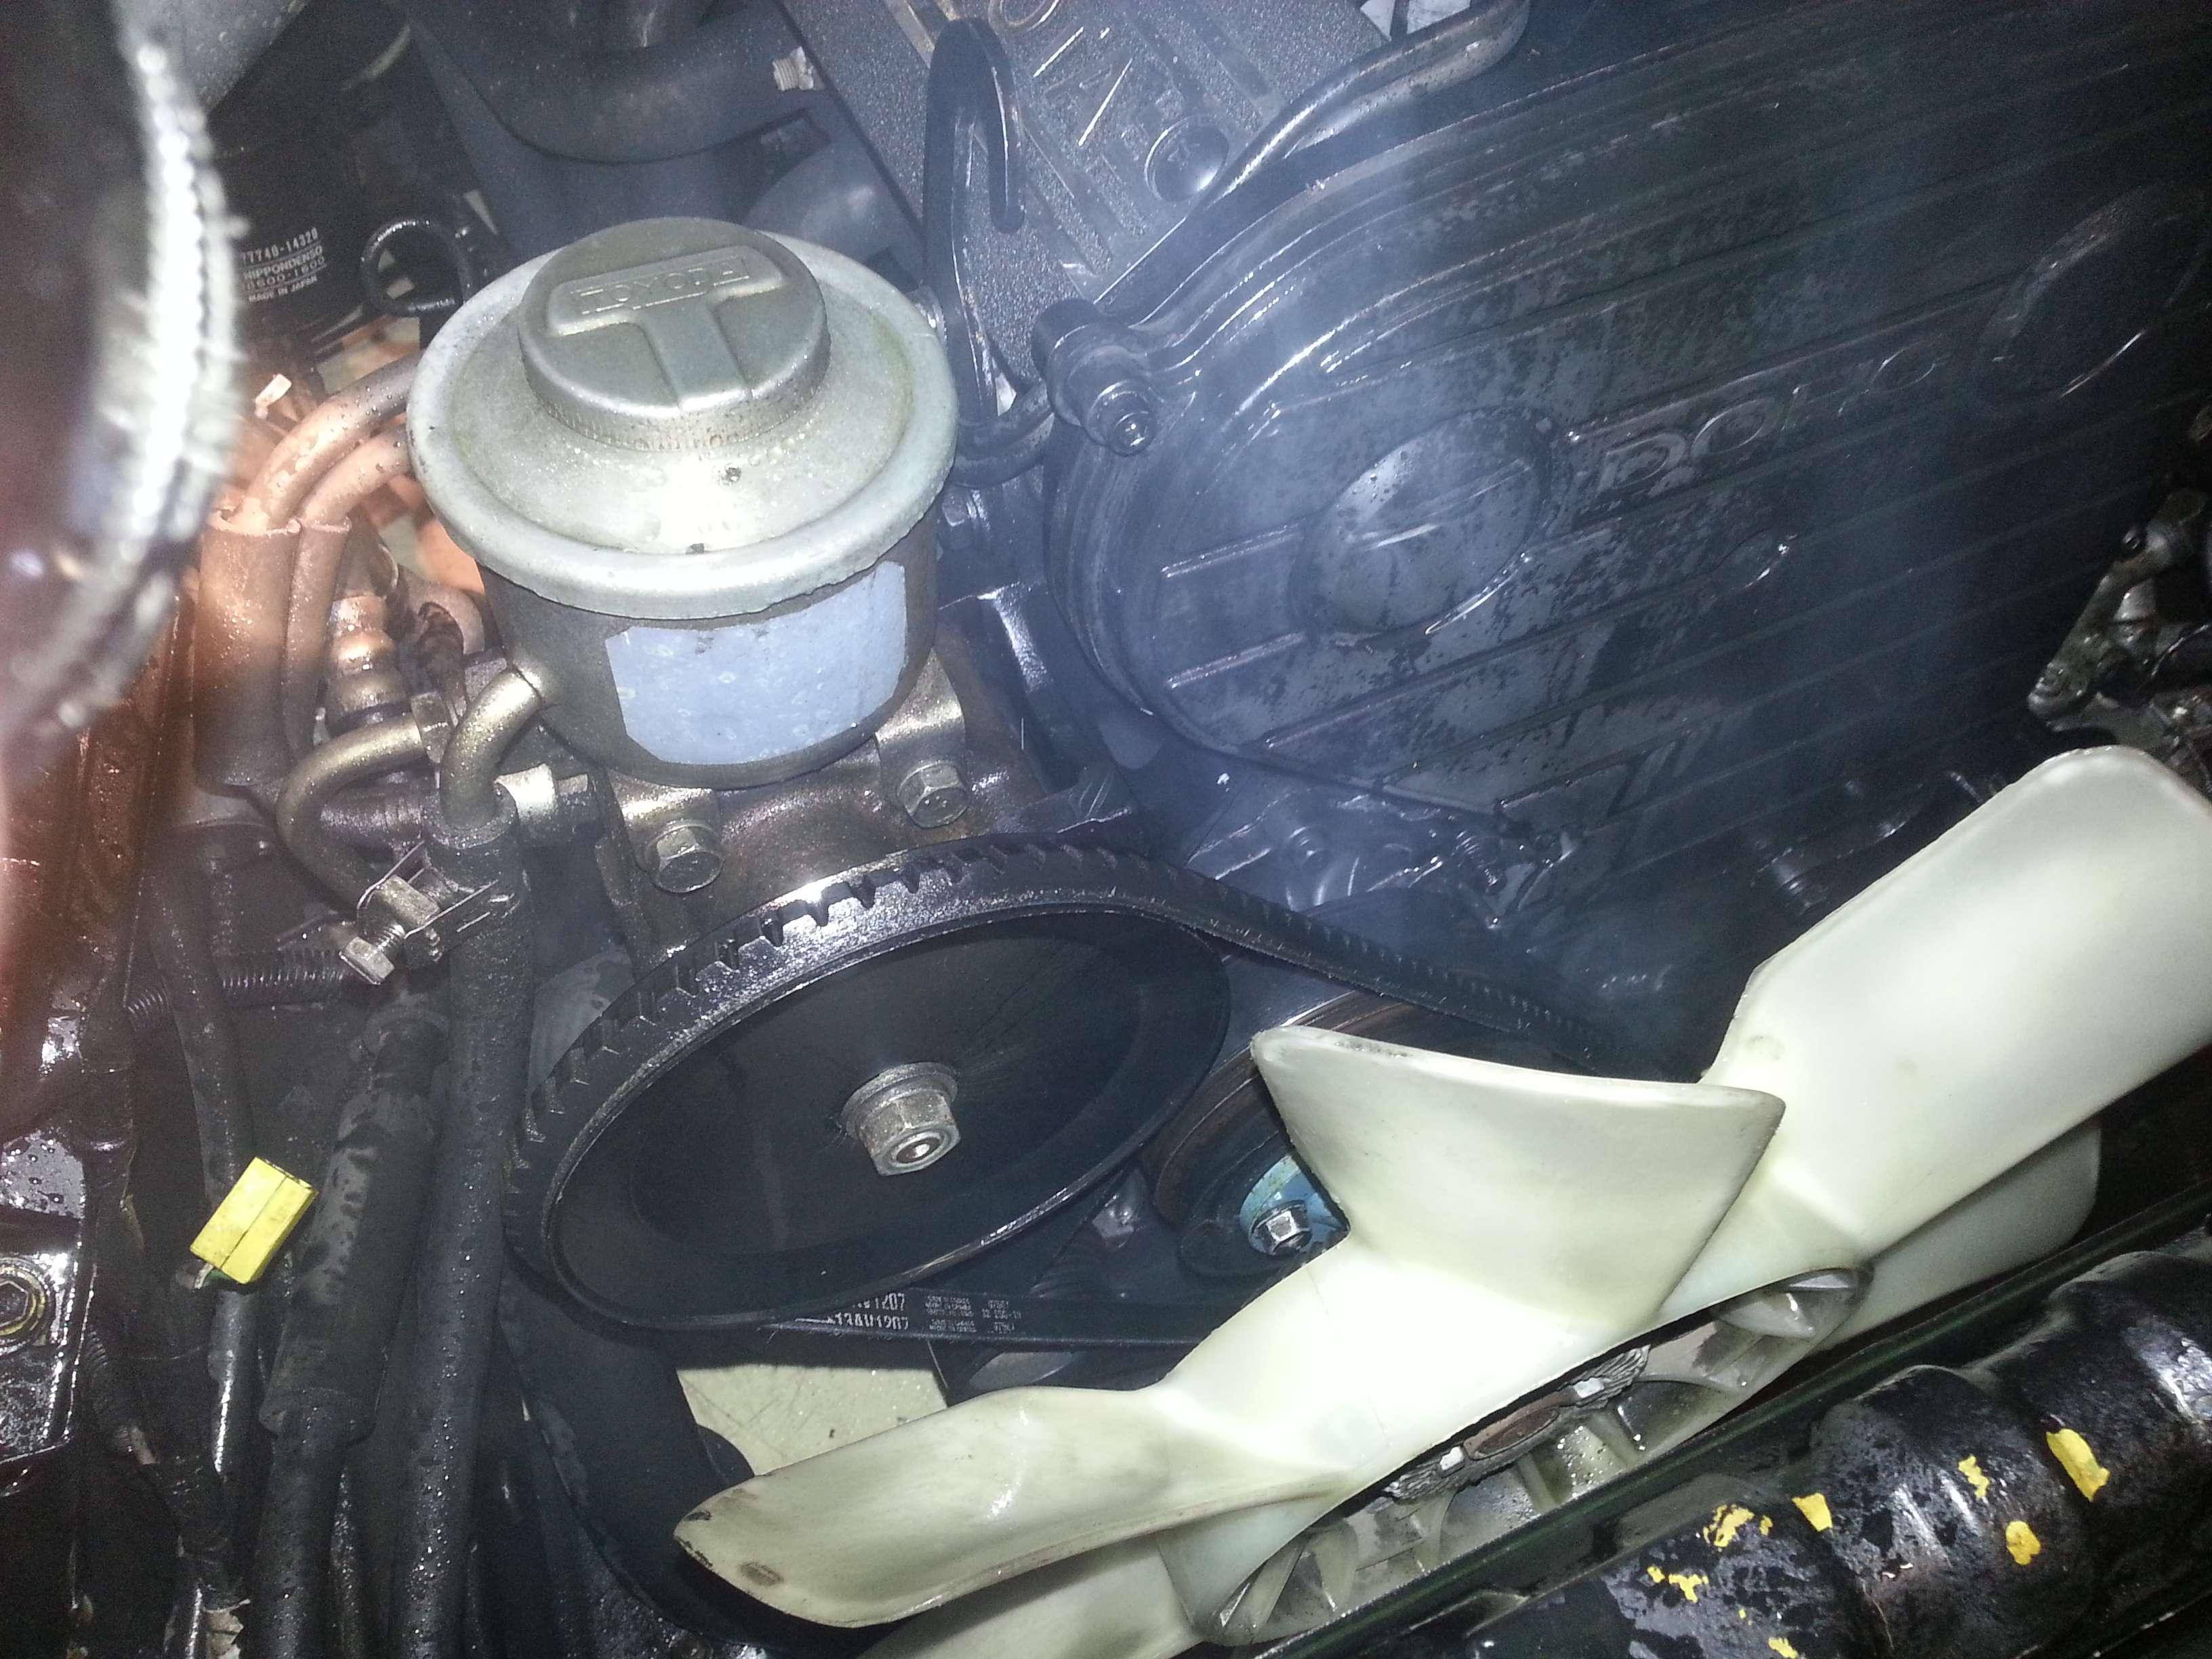 Cltoy 1984 P Type Restoration Archive Toyota Celicasupra Forums Mr2 Engine Swap Wiring Harness Jdm Dli Into